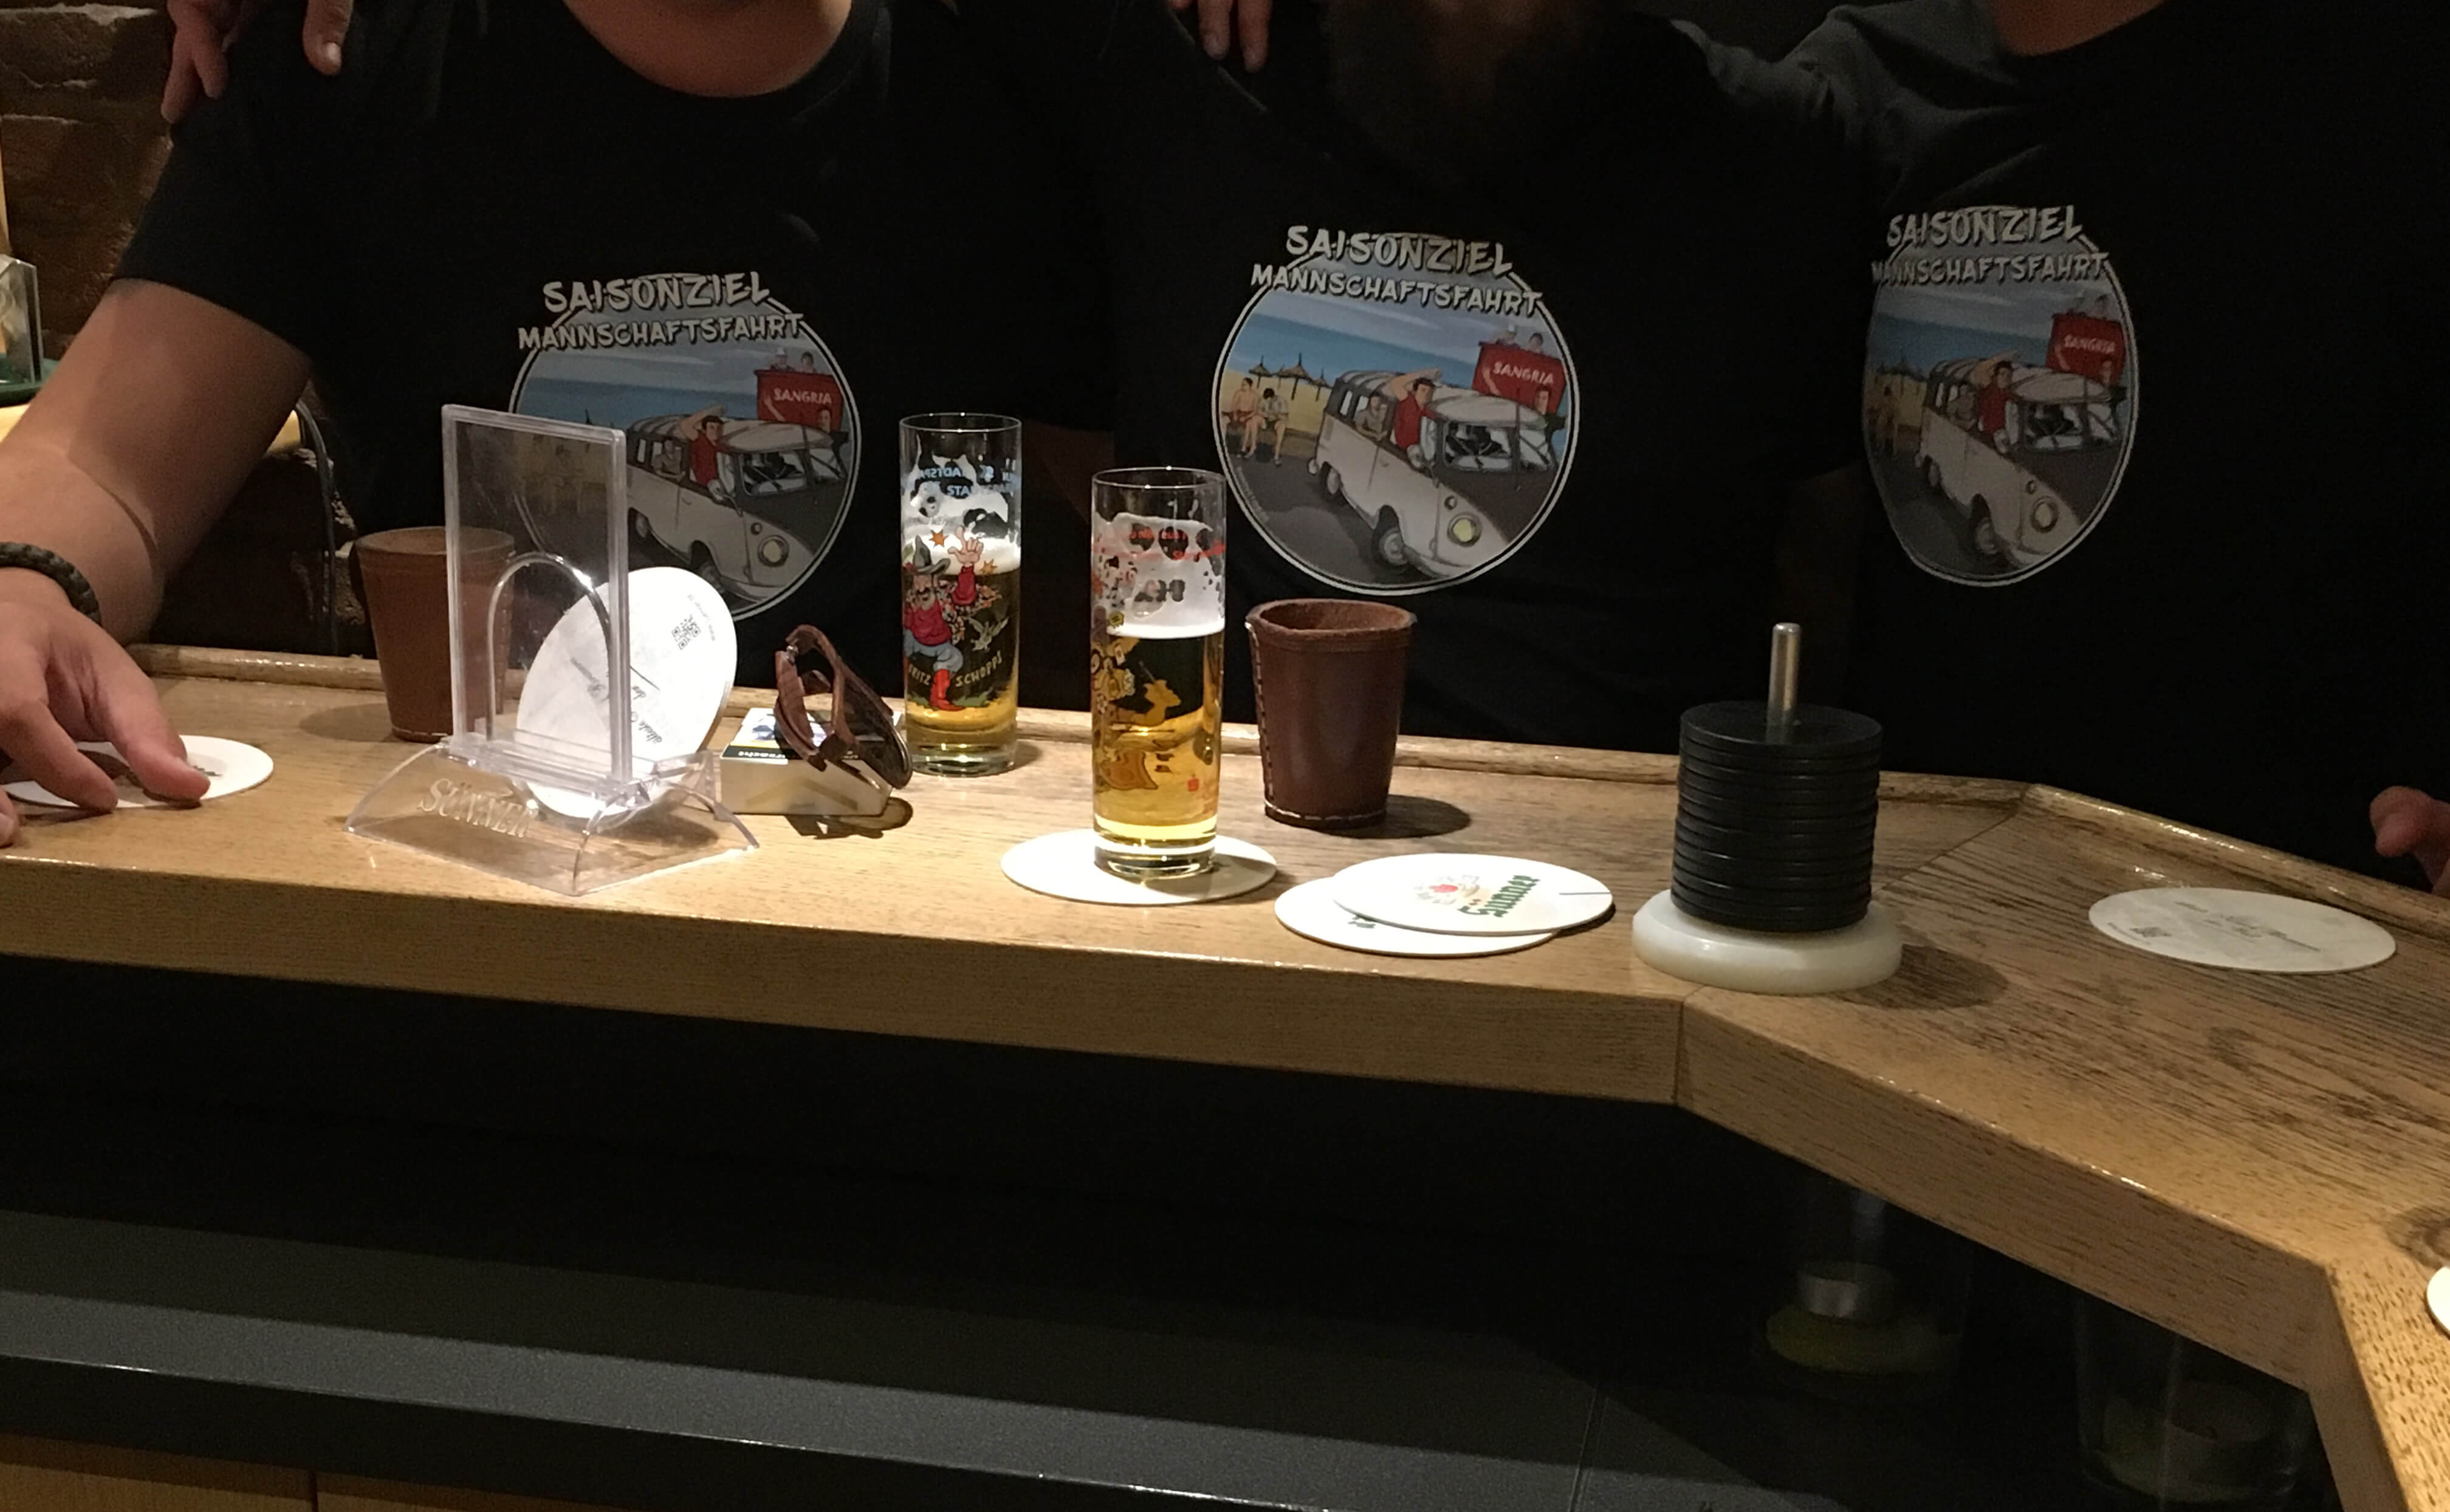 Kreisliga Vereinsheim Mannschaftsabend